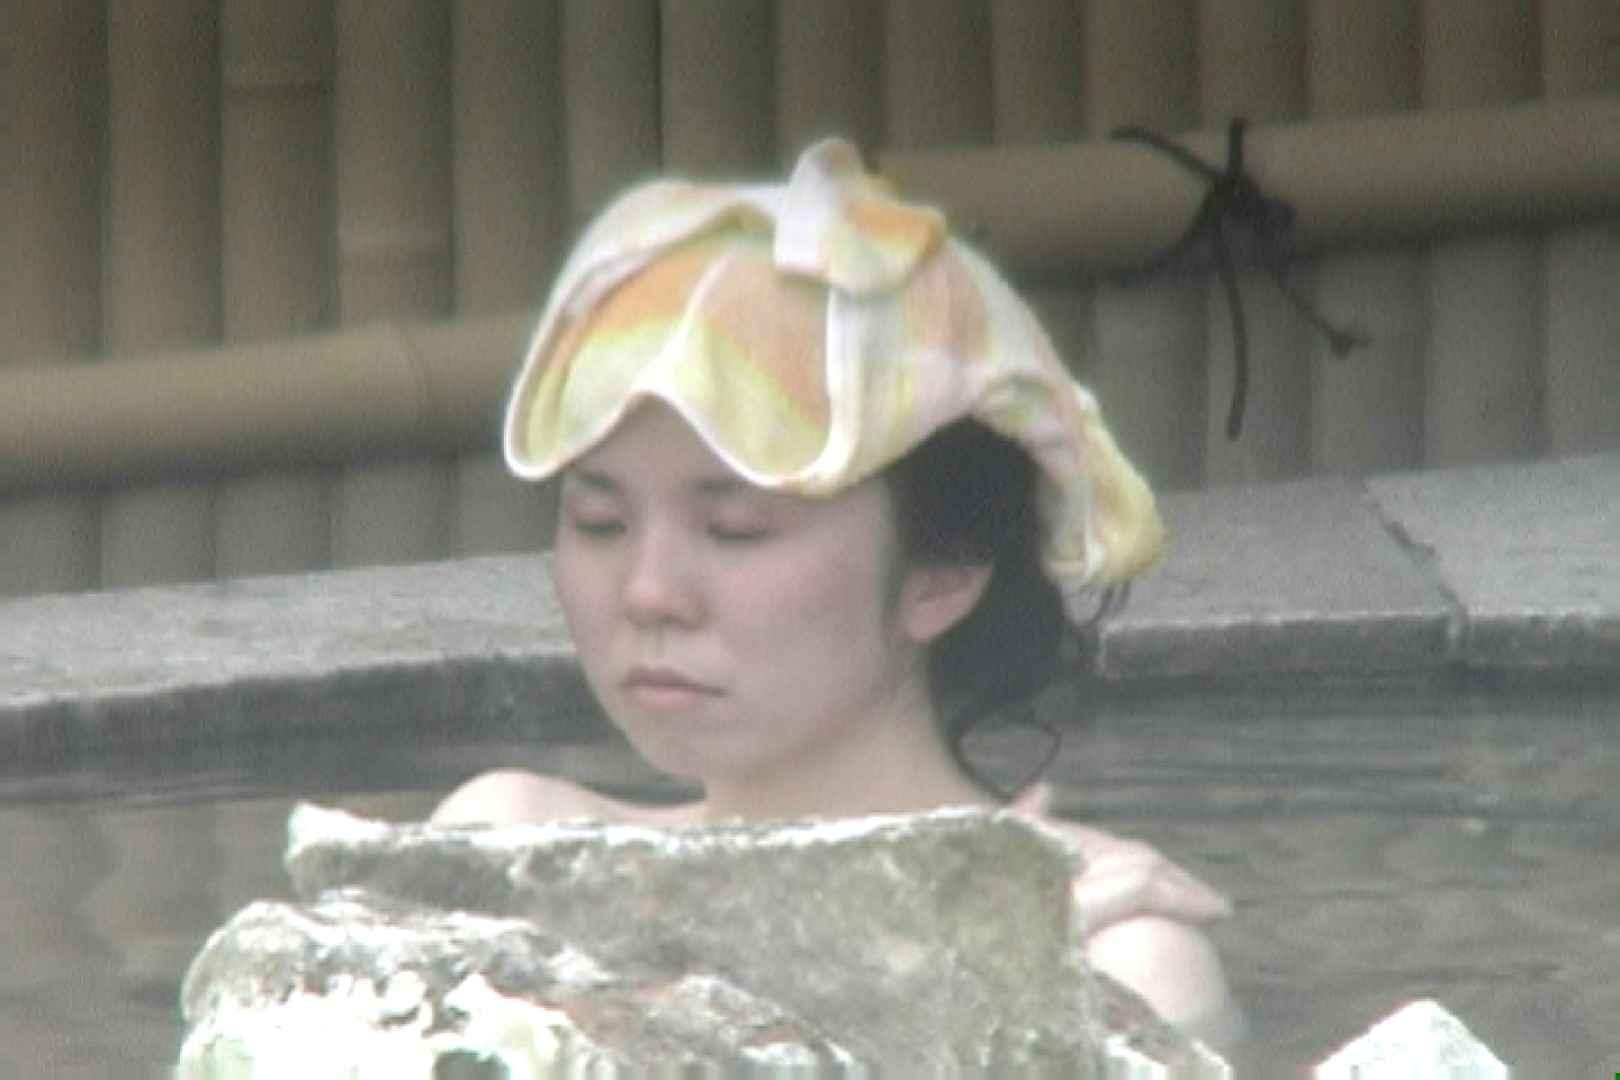 Aquaな露天風呂Vol.687 盗撮シリーズ | 露天風呂編  93PIX 67